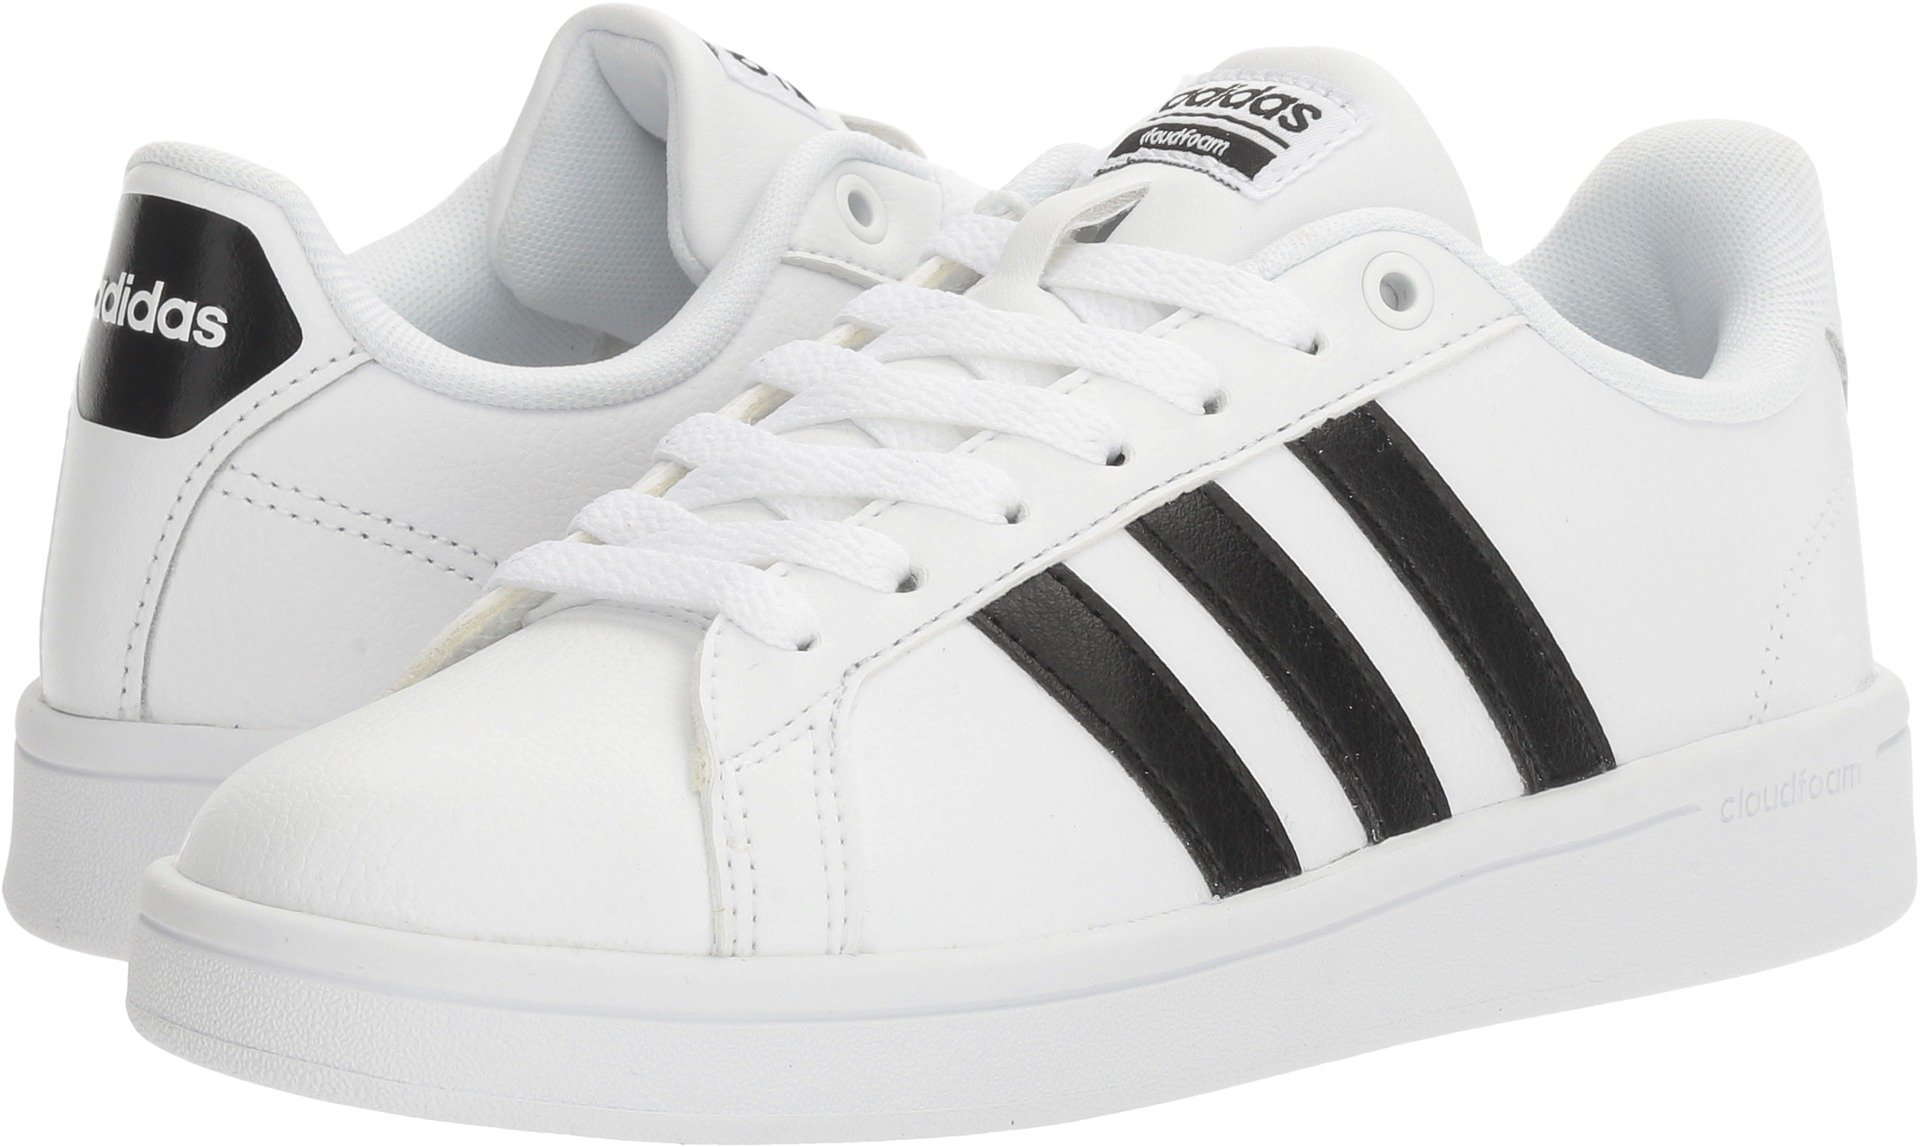 ویکالا · خرید  اصل اورجینال · خرید از آمازون · adidas Women's Shoes | Cloudfoam Advantage Sneakers, Black/White, (7 M US) wekala · ویکالا